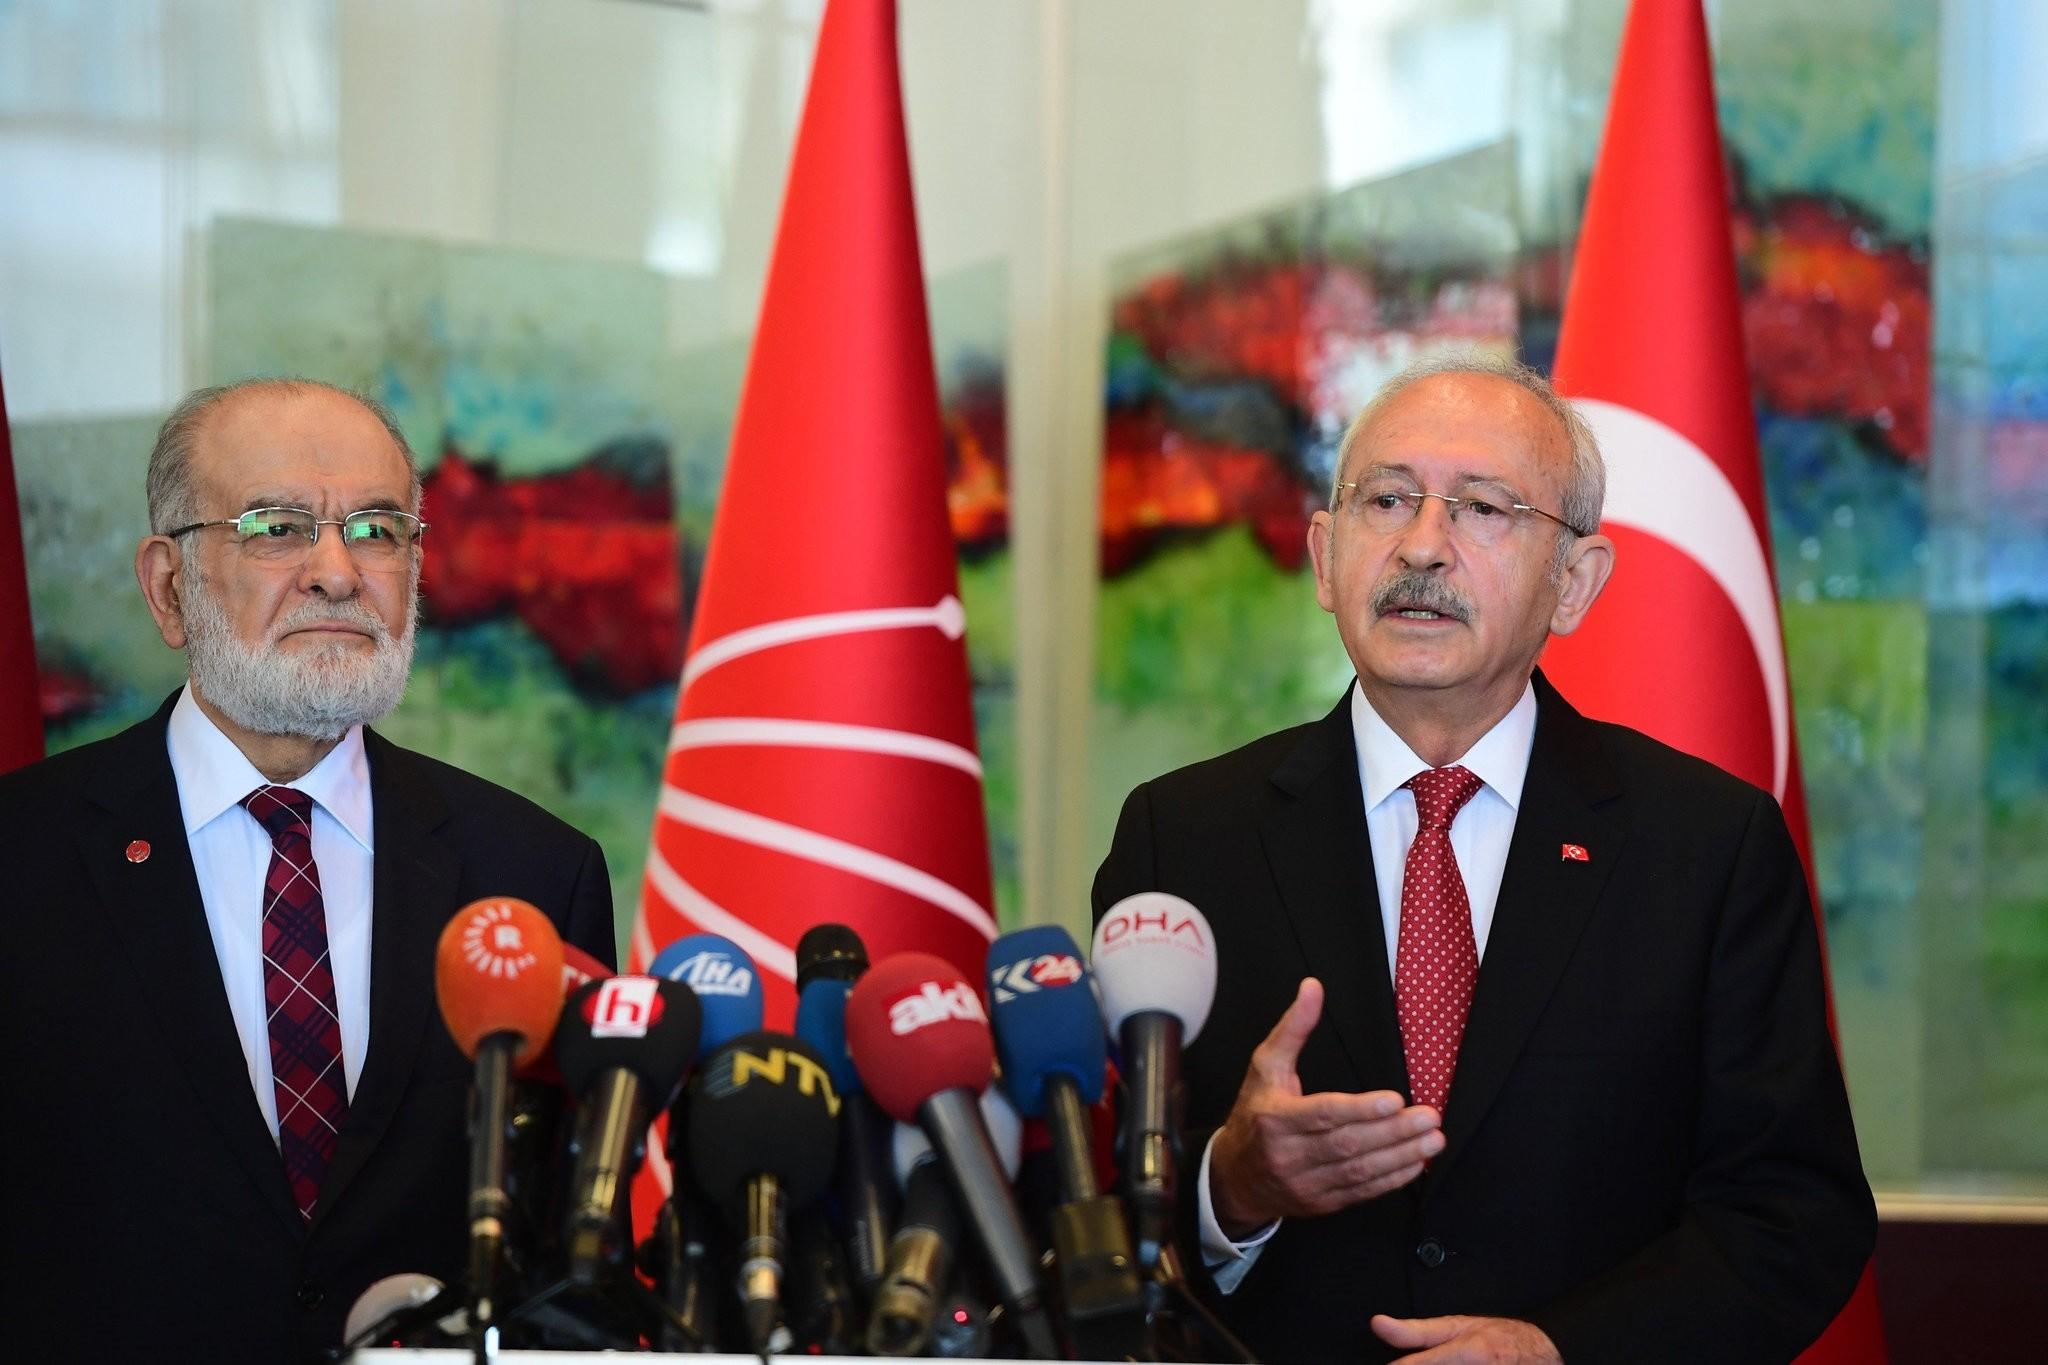 SP Chairman Temel Karamollaou011flu (L) with CHP Chairman Kemal Ku0131lu0131u00e7darou011flu at the CHP headquarters in Ankara, April 30.